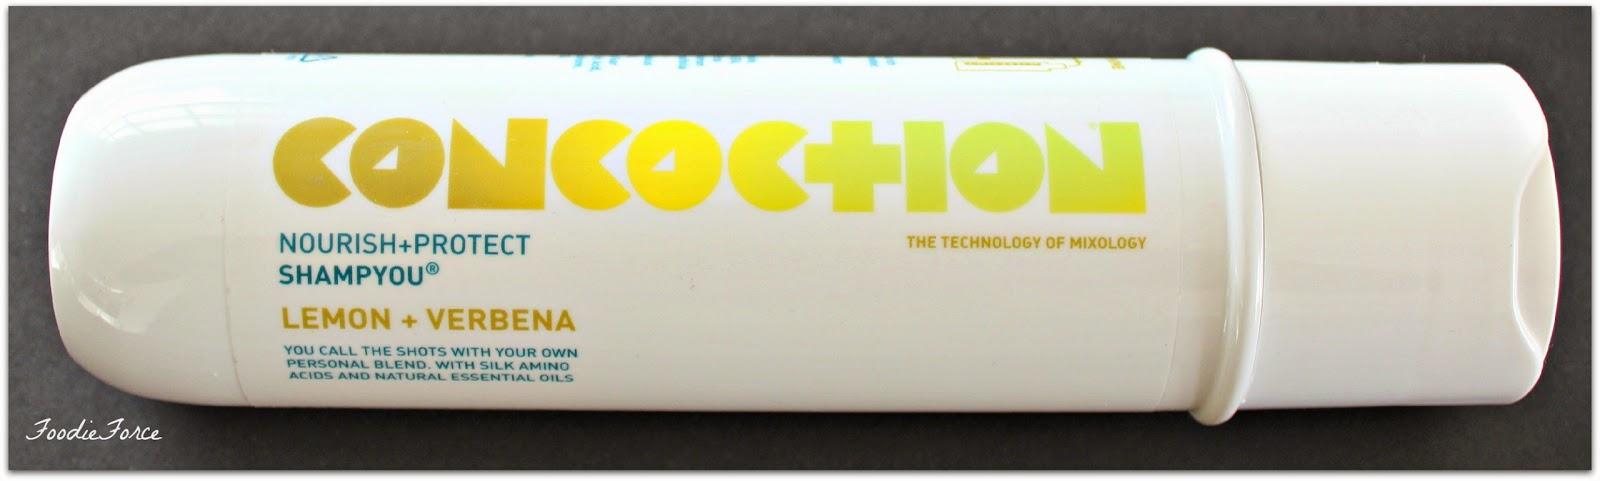 Concoction Shampoo